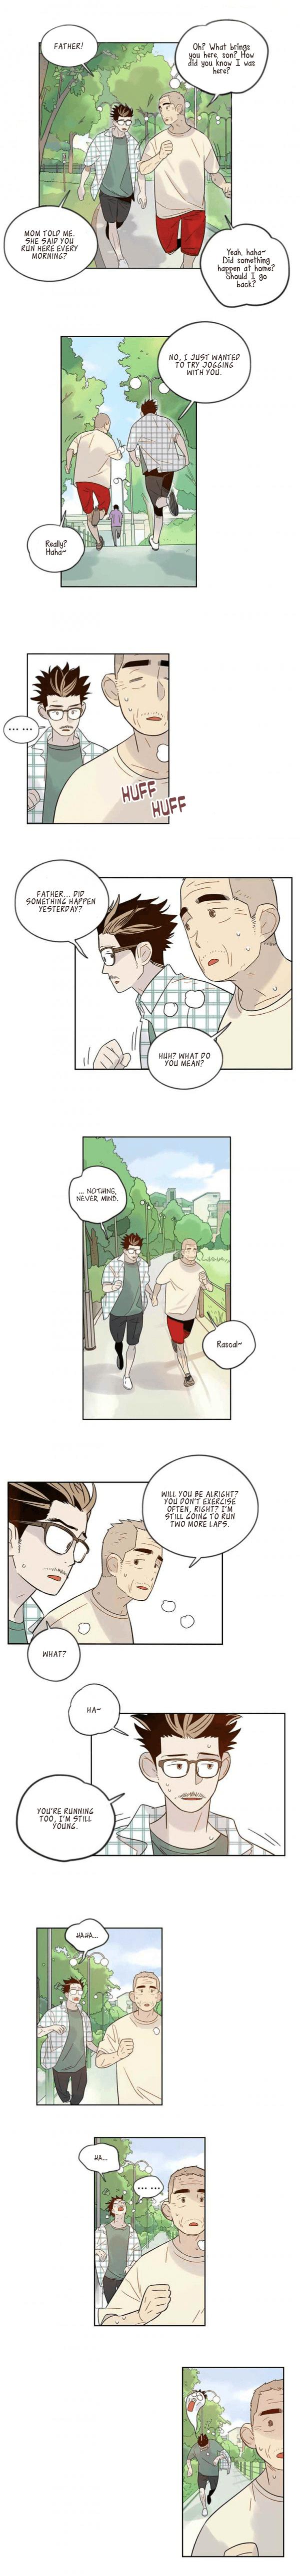 Manga Like a Butterfly - Chapter 41 Page 6